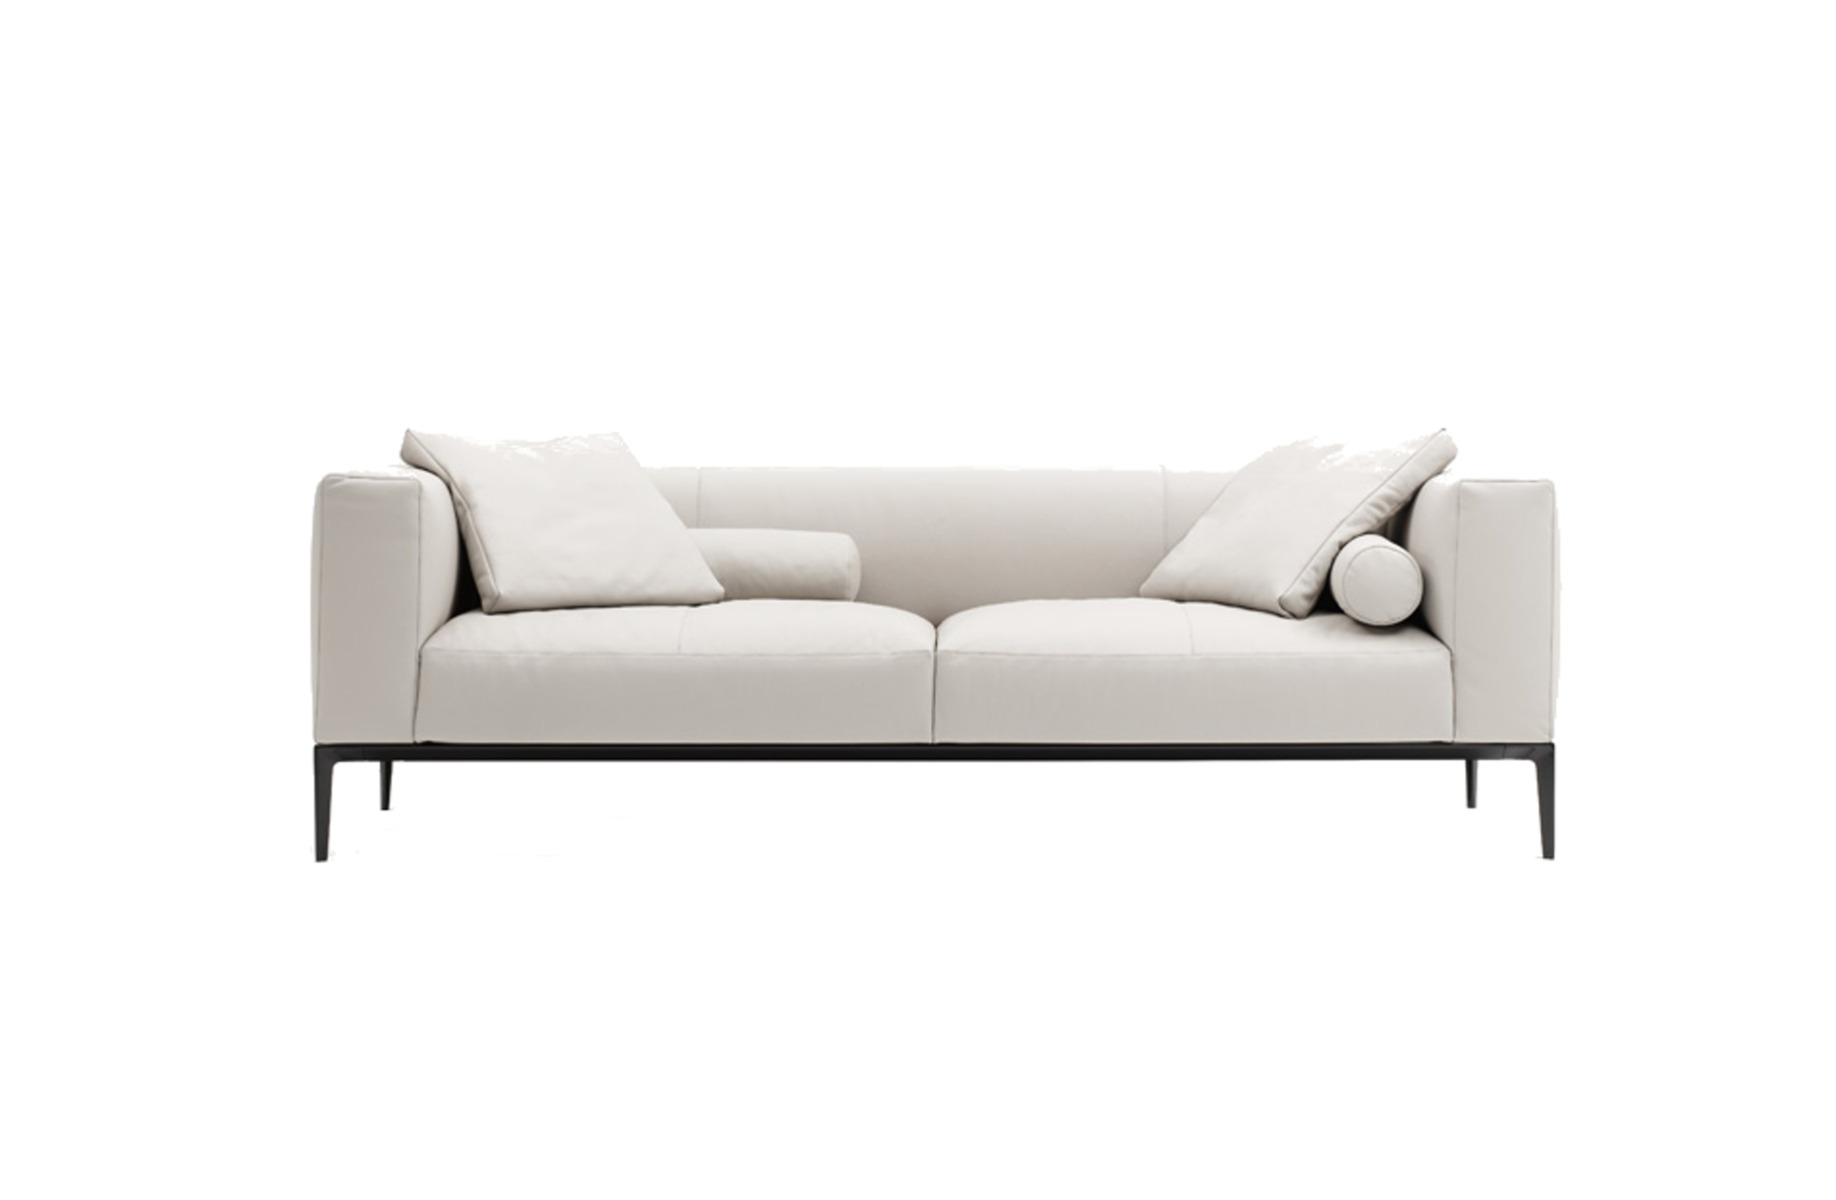 altes sofa entsorgen trendy sofa designer marken beautiful das mbelhaus sofaloft in der sdstadt. Black Bedroom Furniture Sets. Home Design Ideas